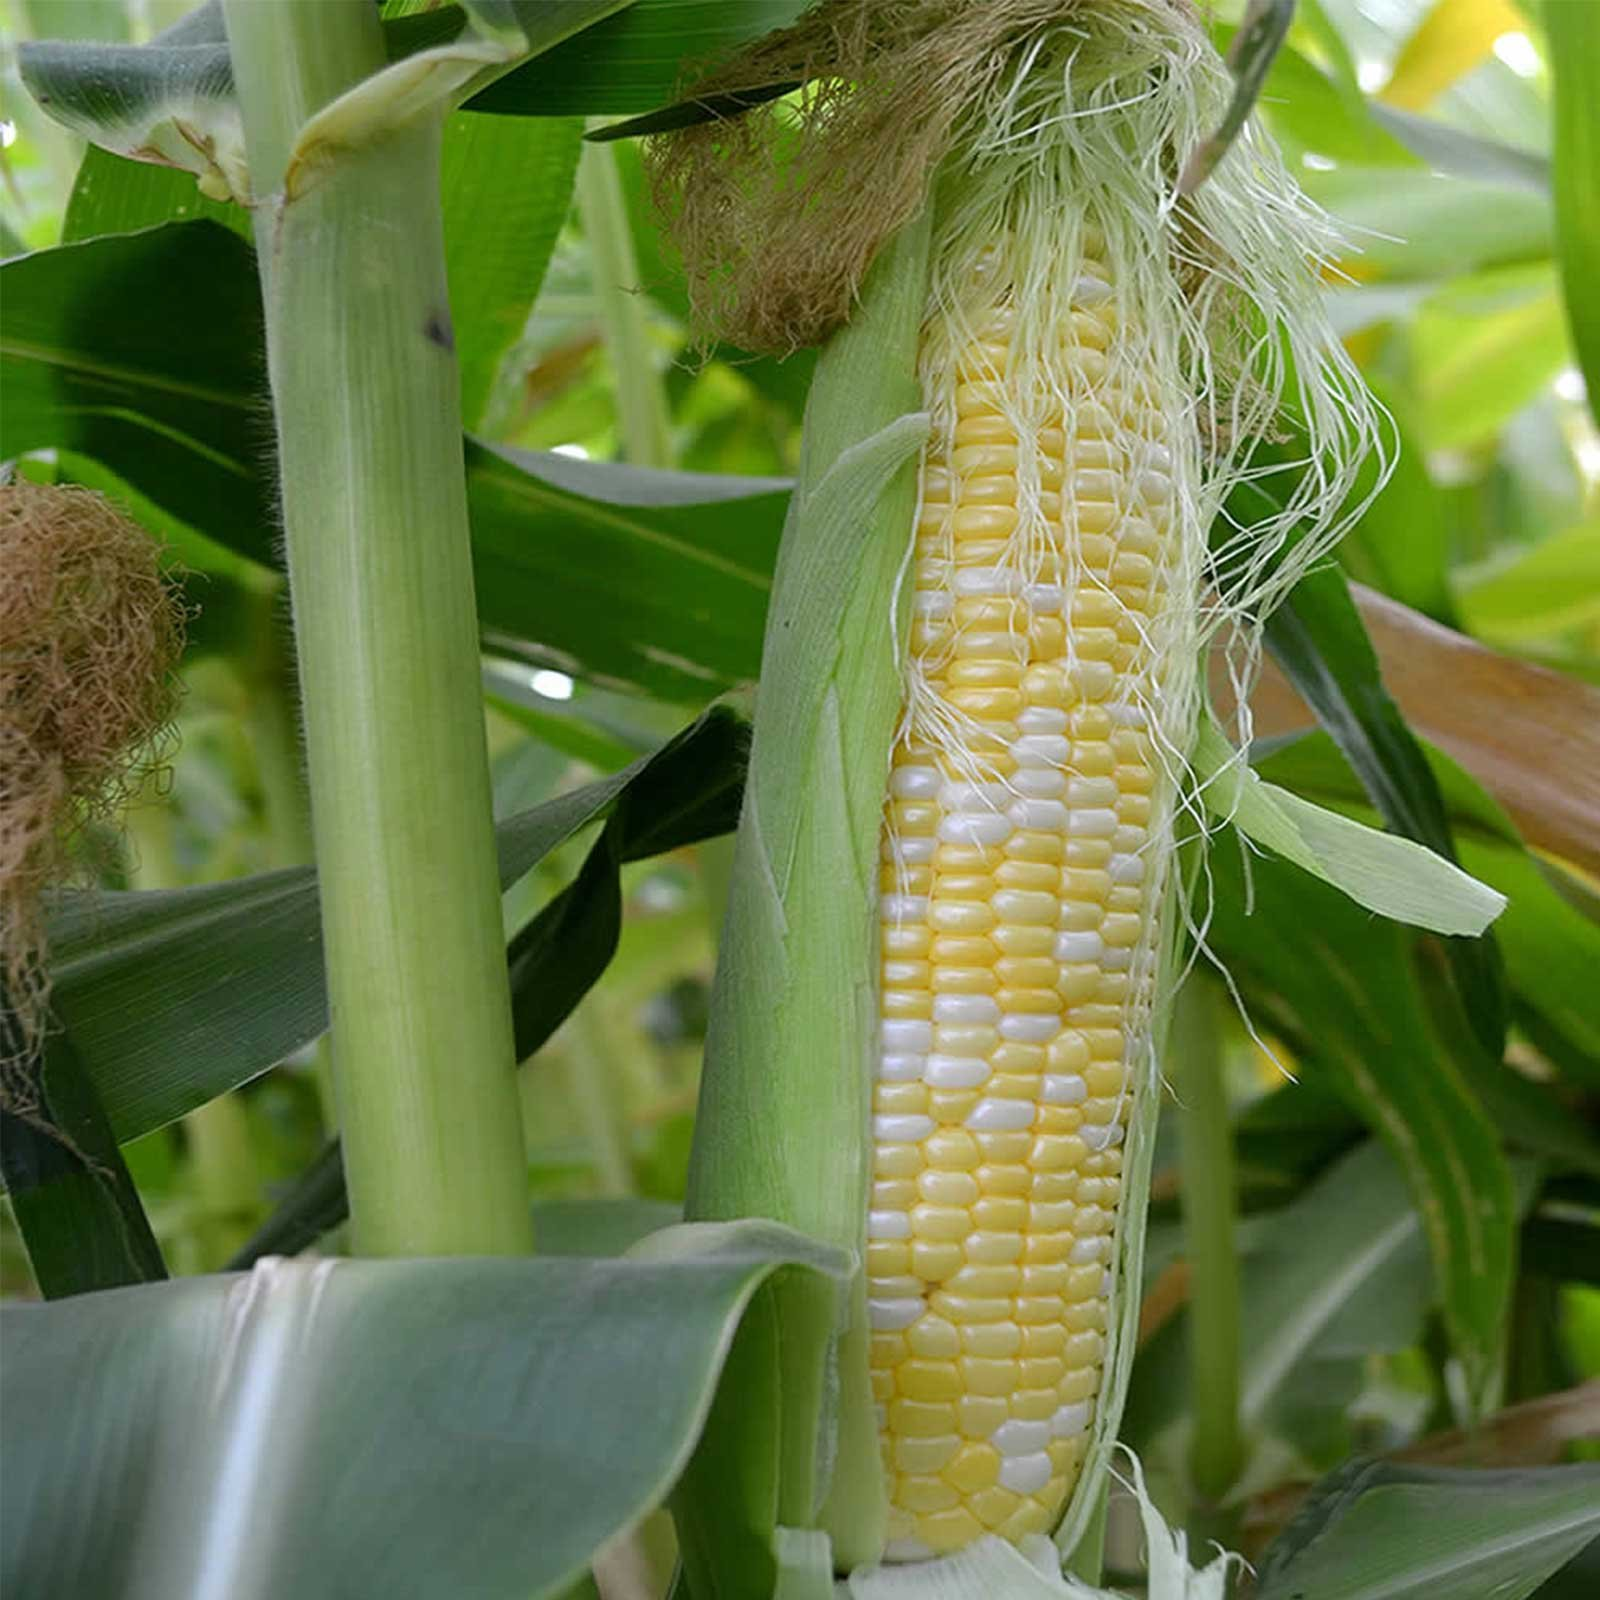 Peaches & Cream Hybrid Corn Garden Seeds - 50 Lb Bulk - Non-GMO Vegetable Gardening Seeds - Yellow & White Sweet (SE) Corn Kernels by Mountain Valley Seed Company (Image #1)